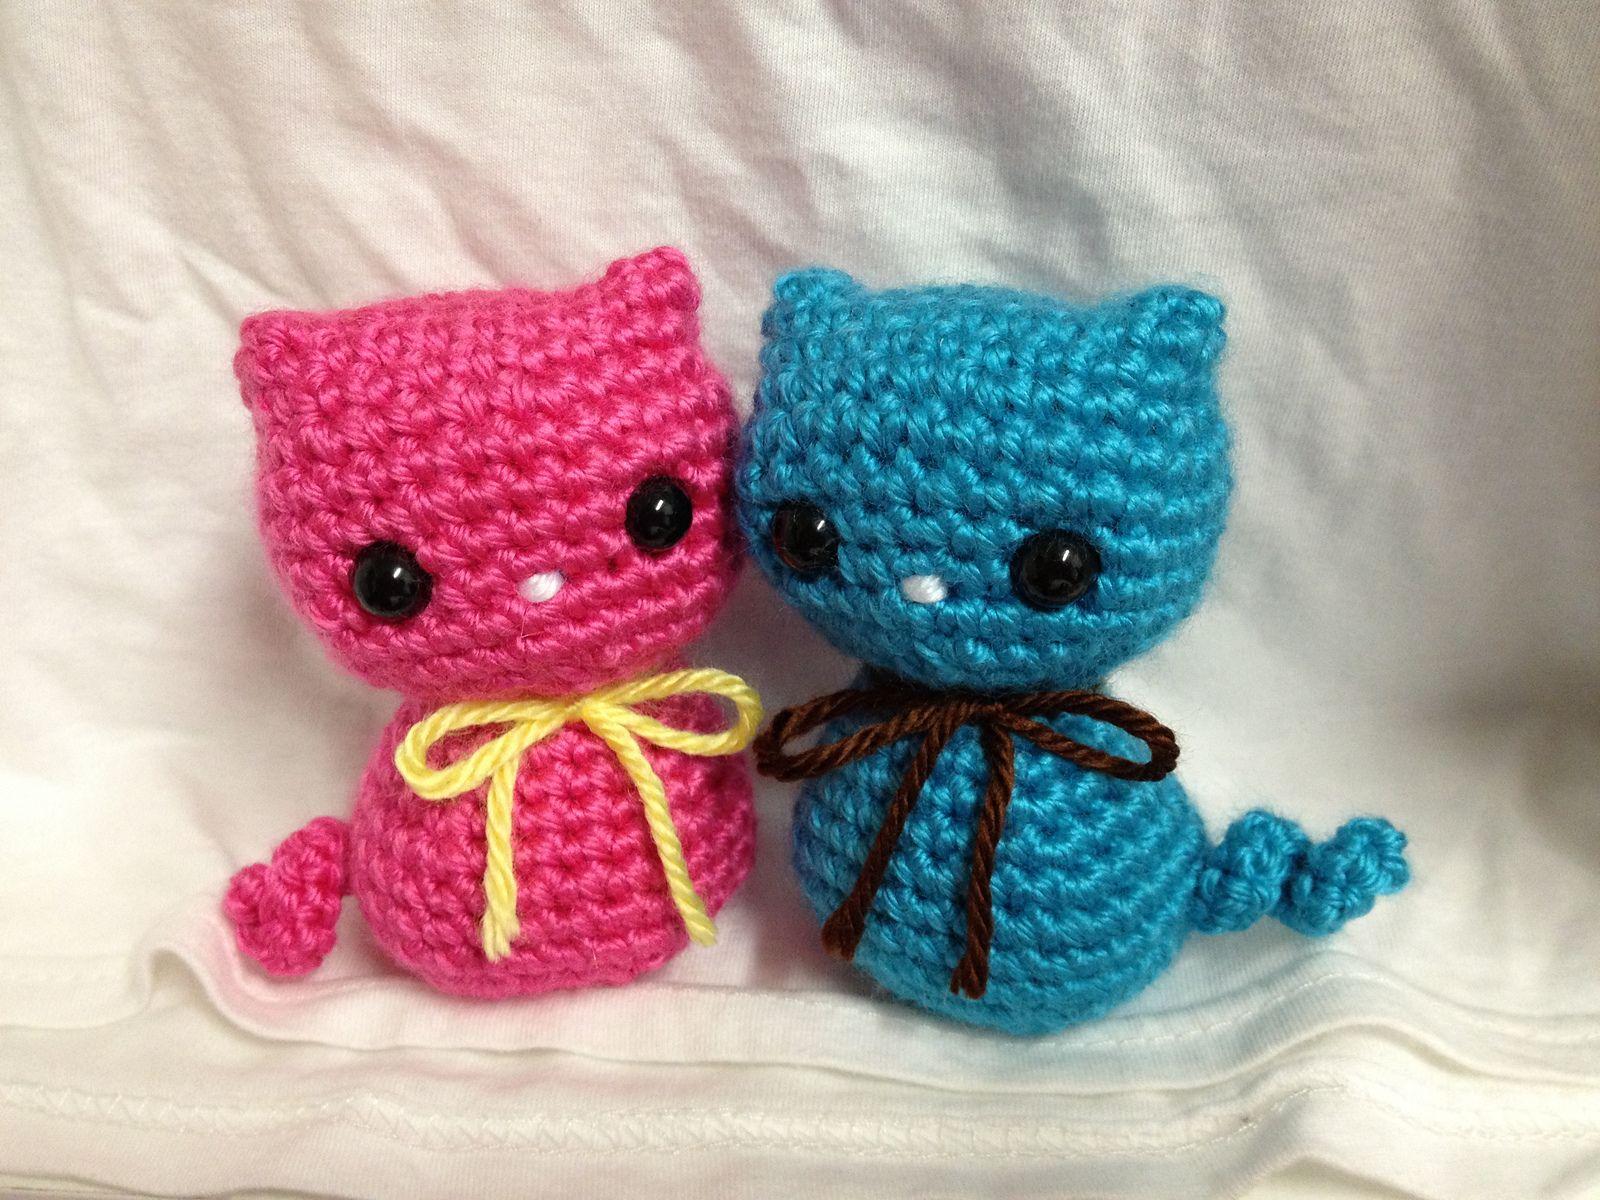 Free Amigurumi Cat : Ravelry: crochet colorful kitty cat doll toy pattern by dds crochet